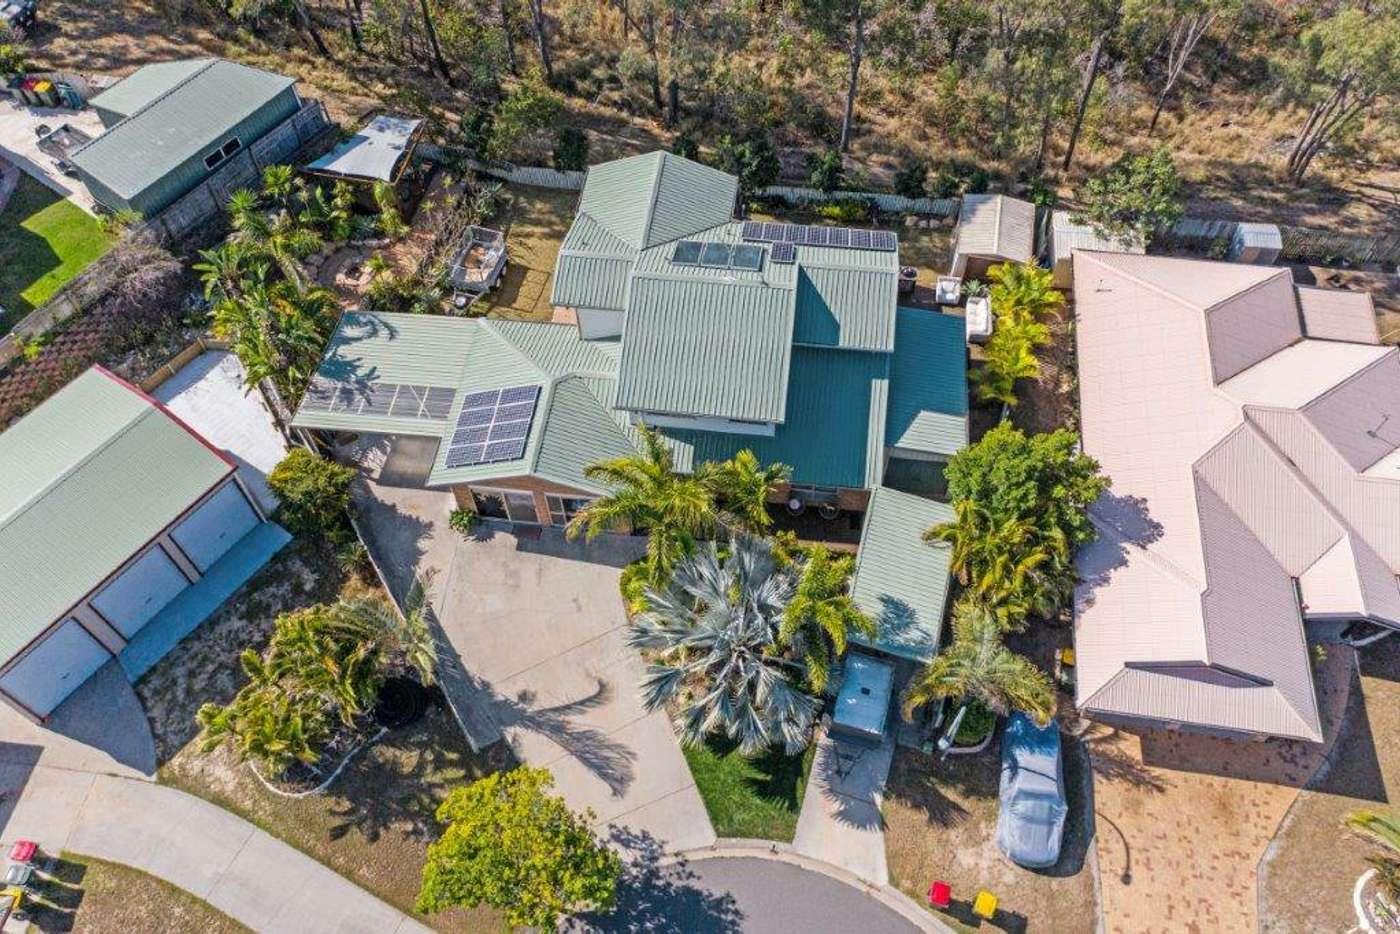 Main view of Homely house listing, 10 Yaraan Court, Boyne Island QLD 4680